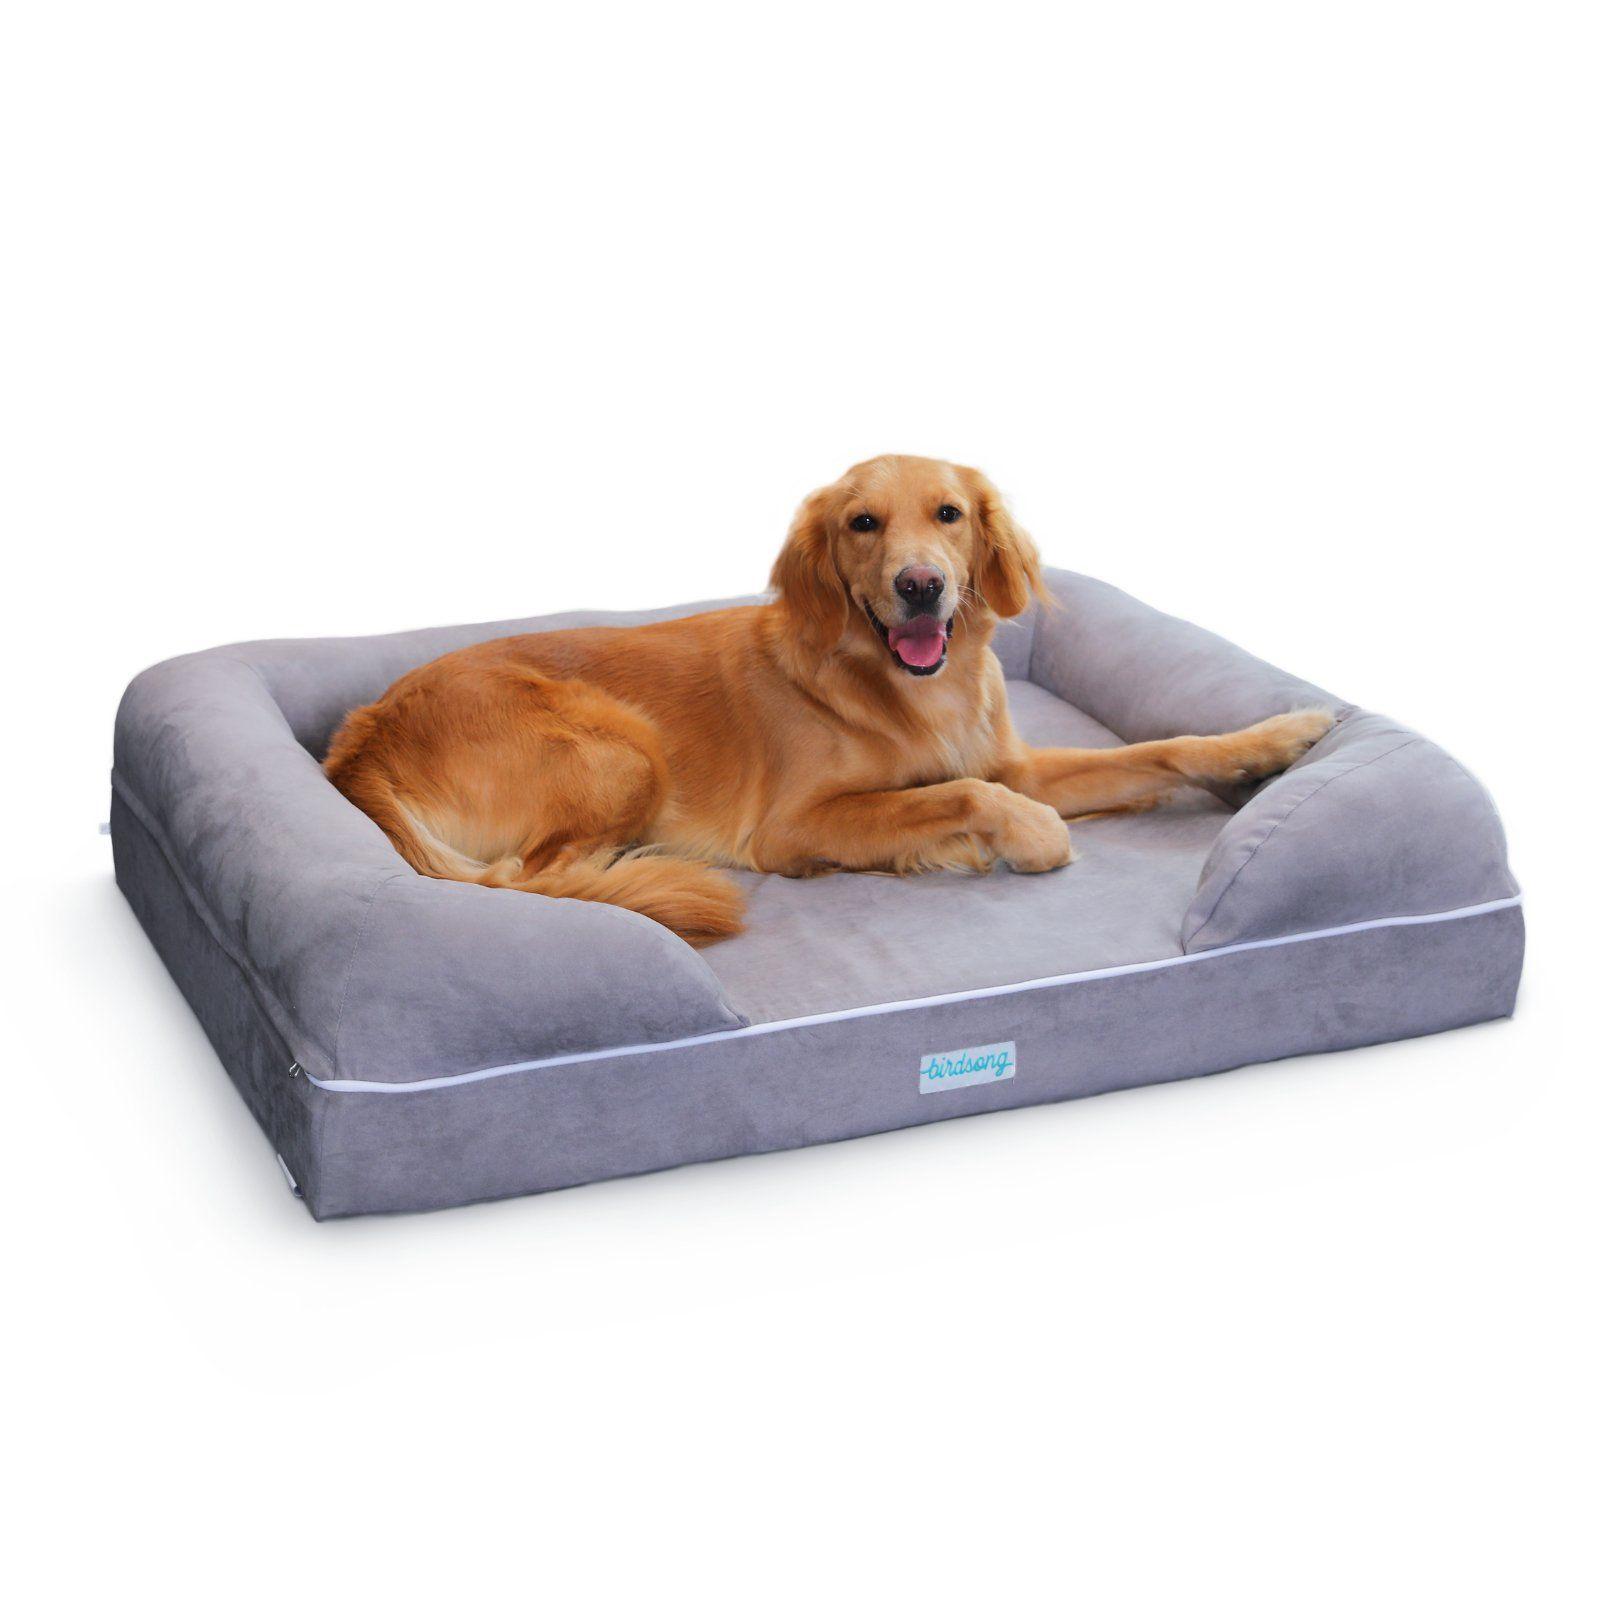 Rüya TripleLayer Orthopedic Foam Dog Bed Dog bed large